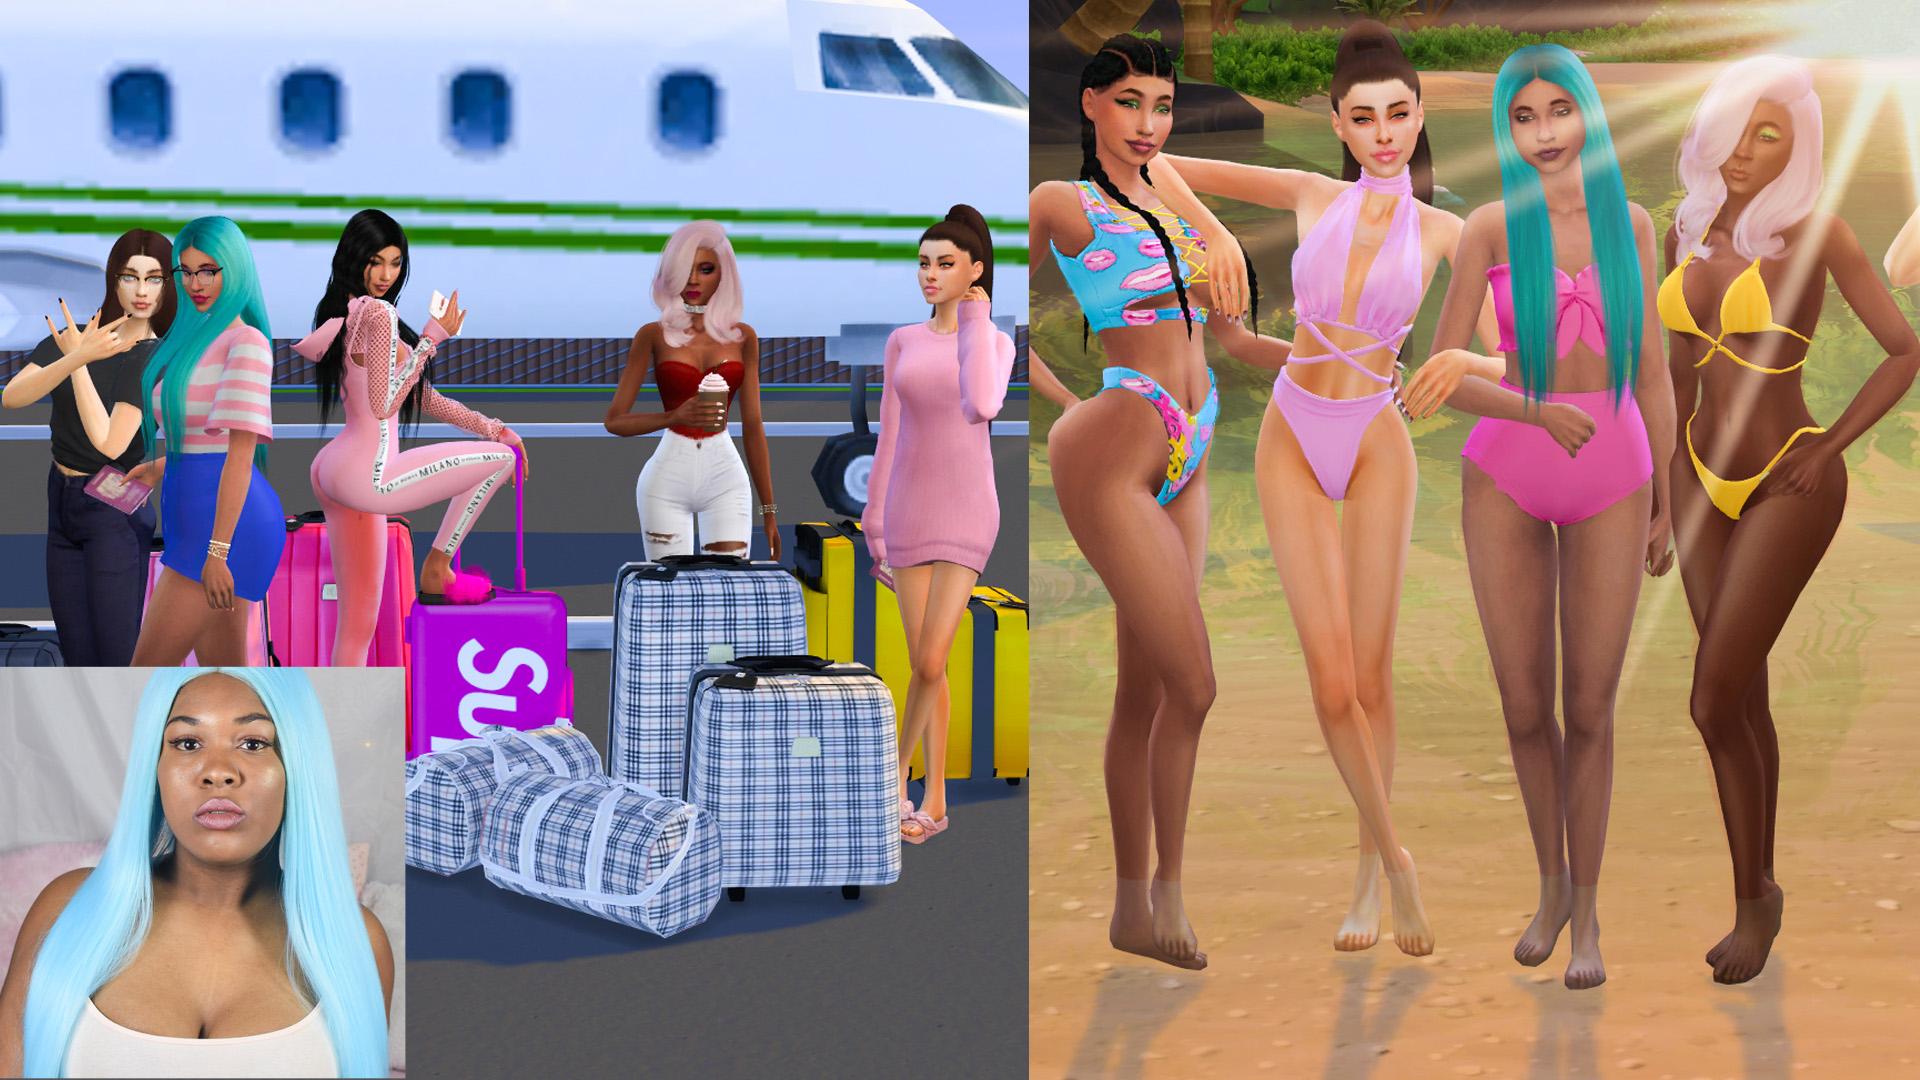 Sims 4 CC Custom Content Haul | Sulani bound! | Swimwear, beachwear, summer hot weather clothing, etc | Island Living expansion pack | Desire Anne Gaming